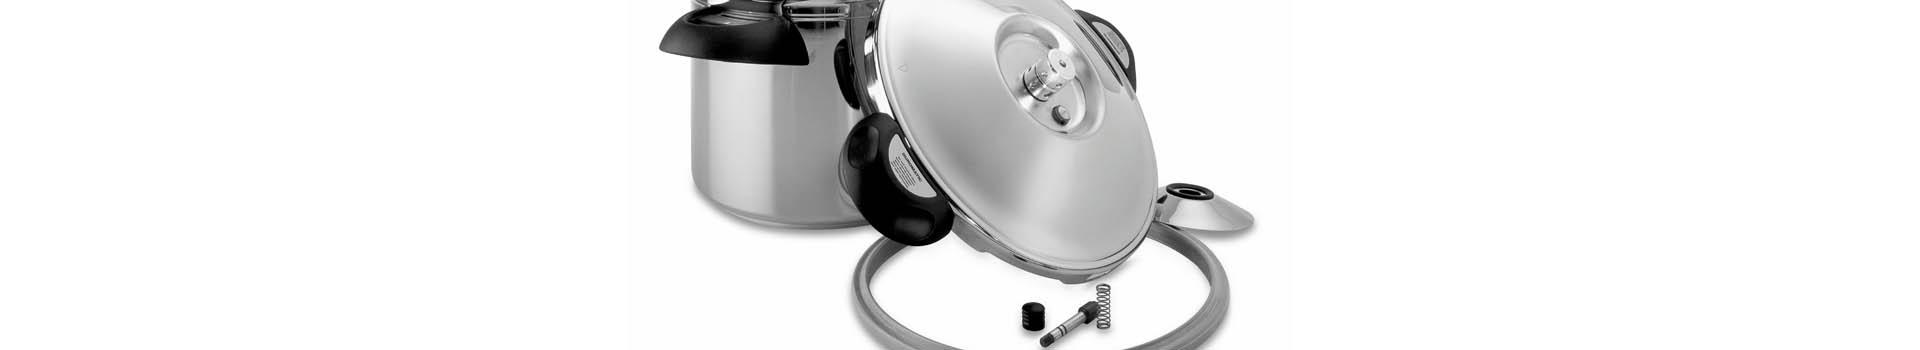 Pressure Cooker Spare Parts